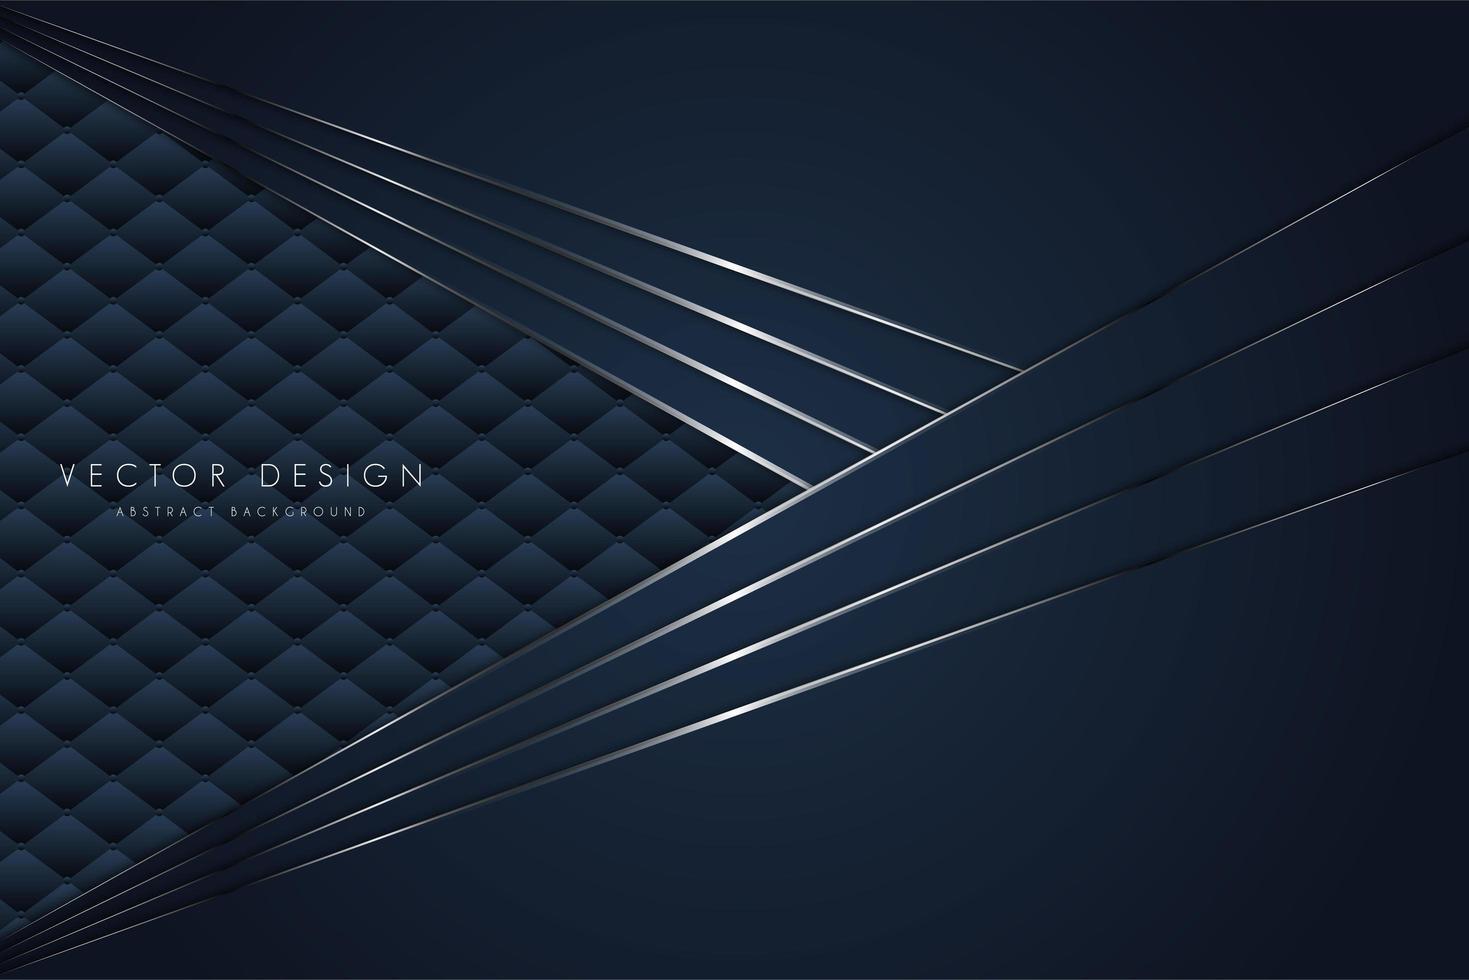 Capas en ángulo azul metálico sobre textura de tapicería vector